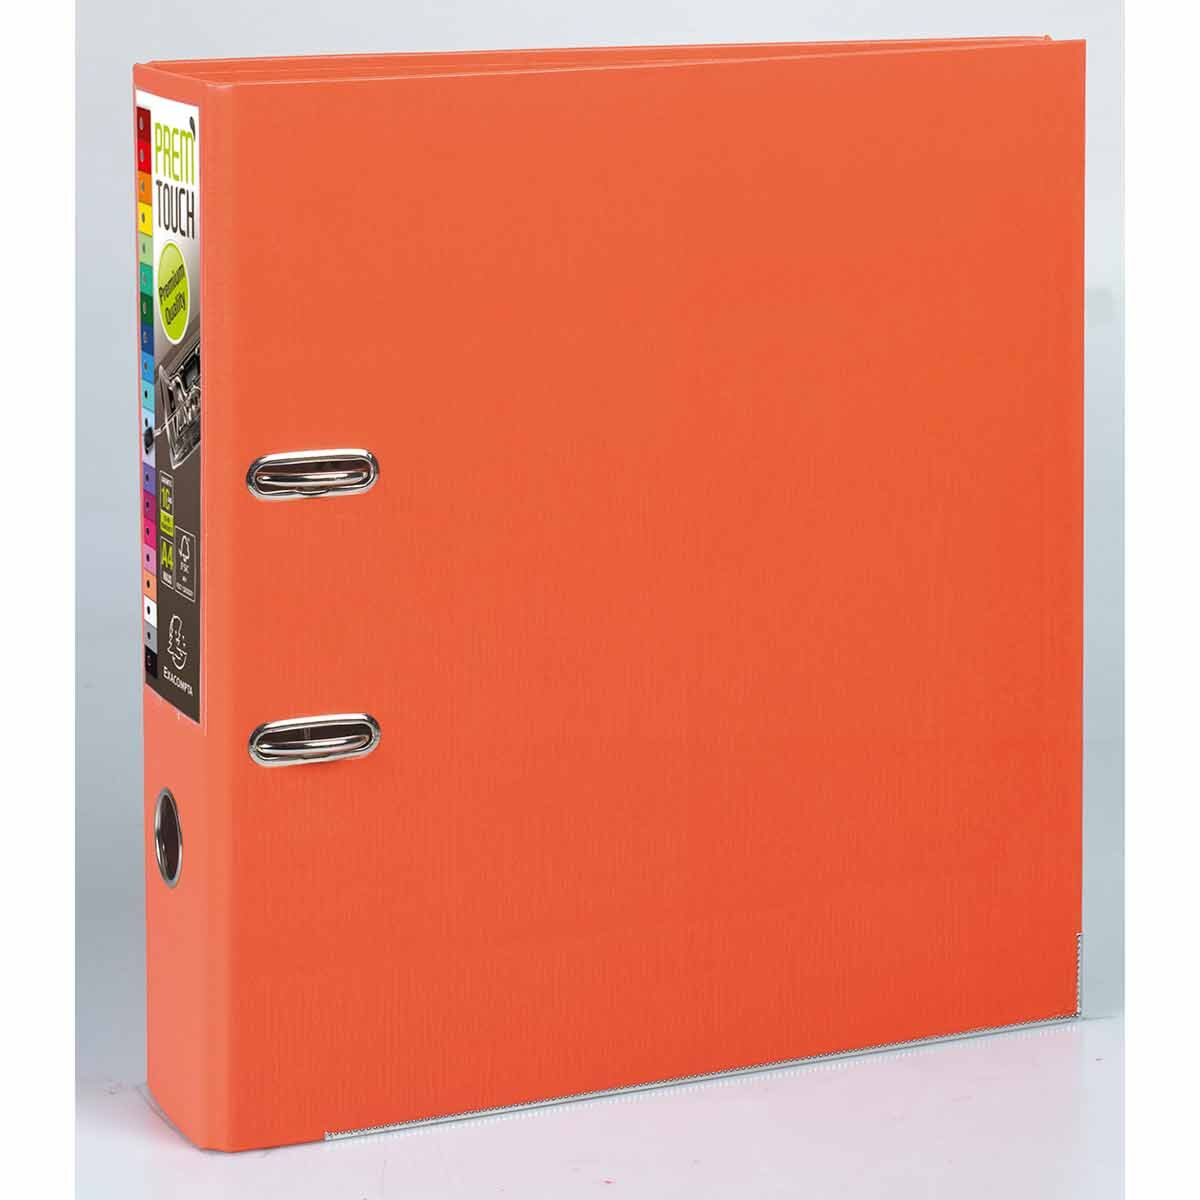 Exacompta PremTouch Lever Arch File A4 Plus PP 80mm Pack of 10 Orange